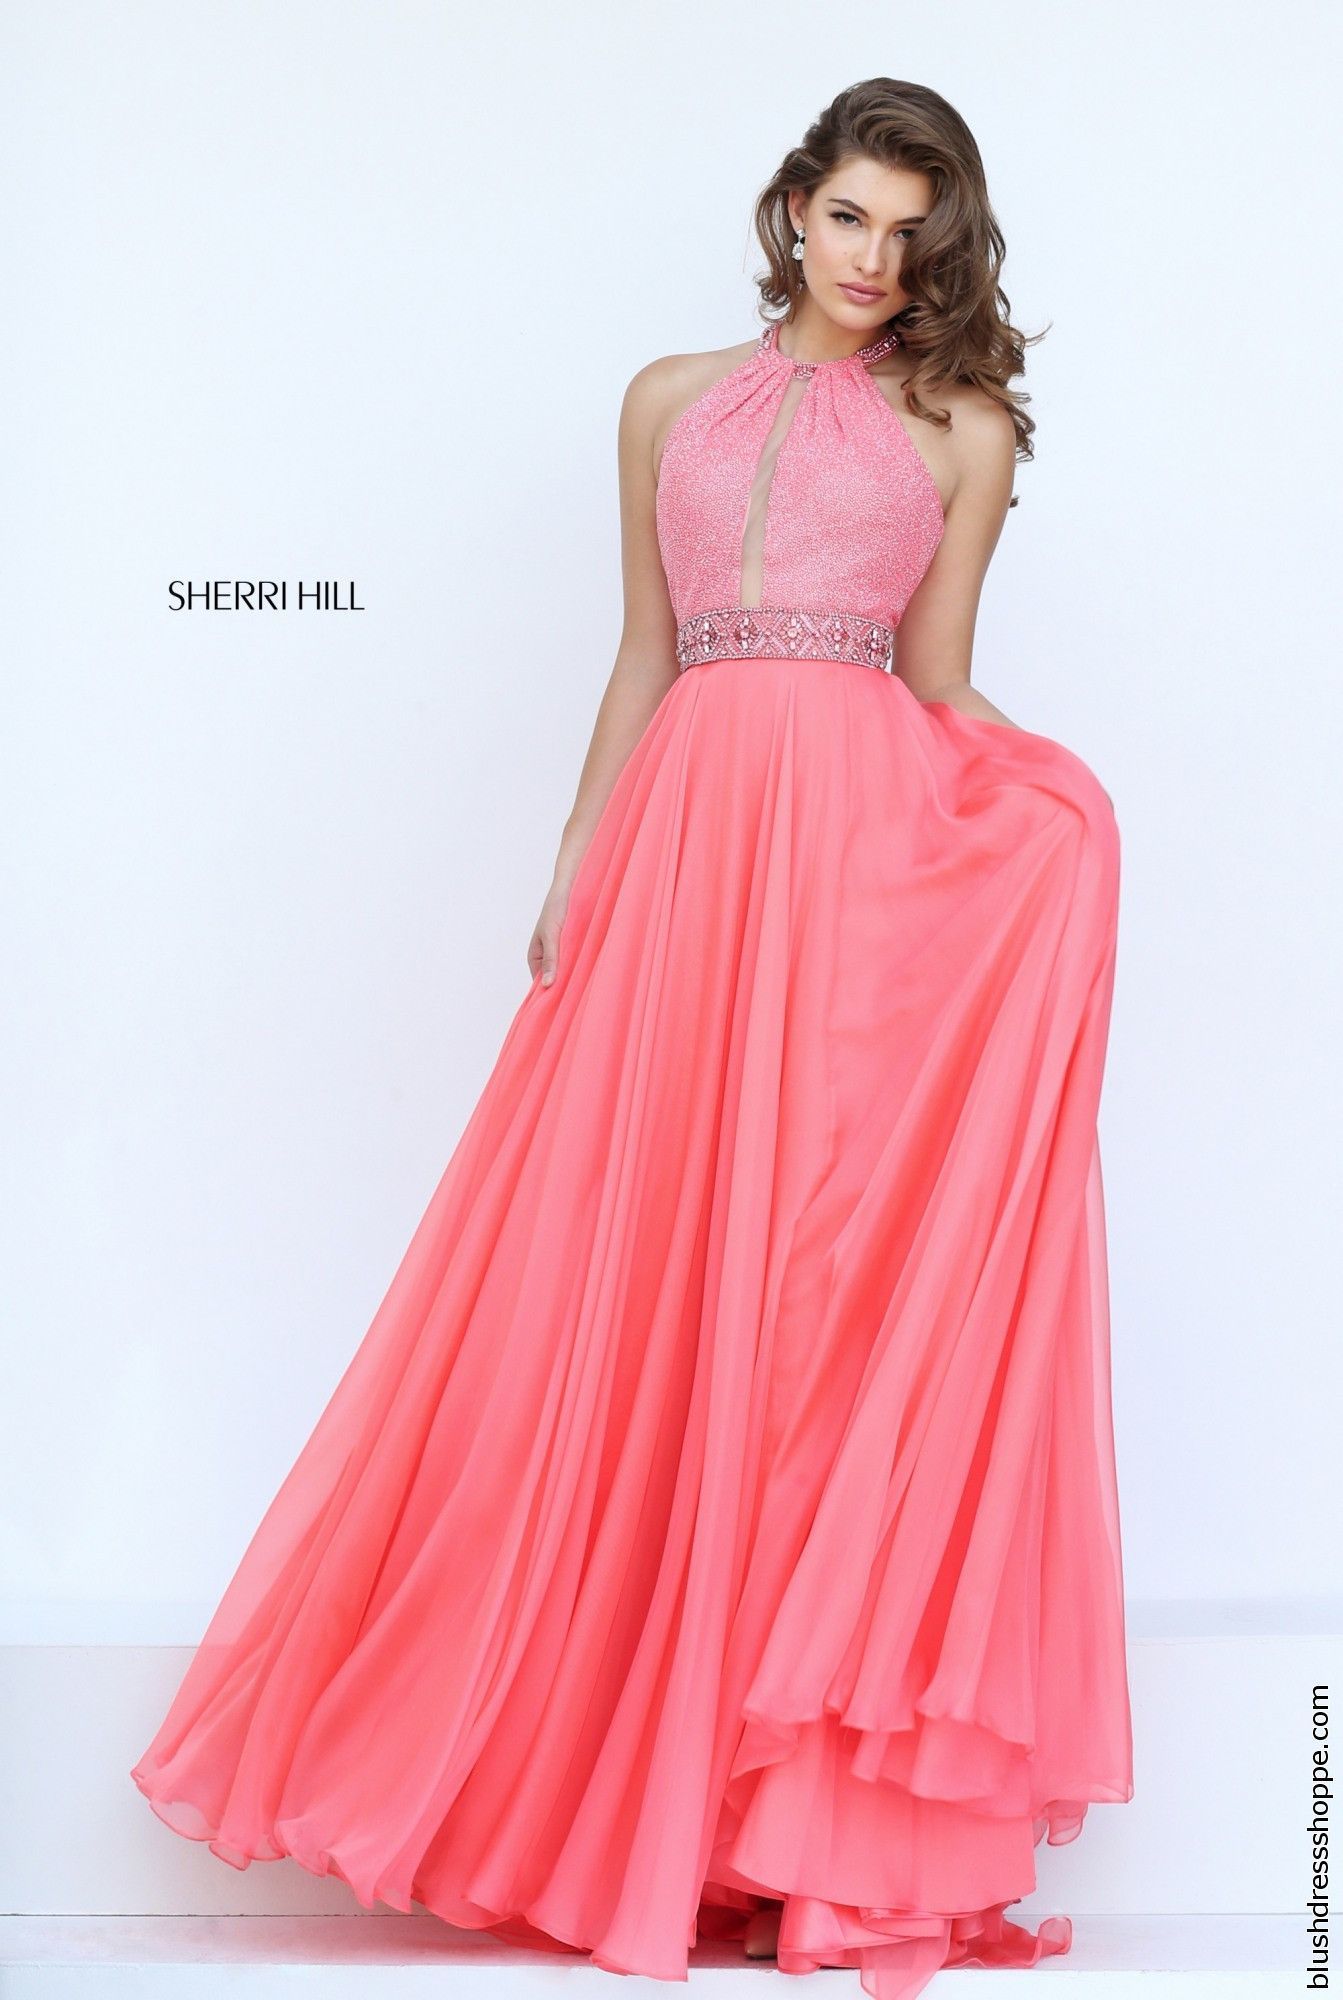 Sherri Hill 50454 | Products | Pinterest | Dios es mi fuerza ...